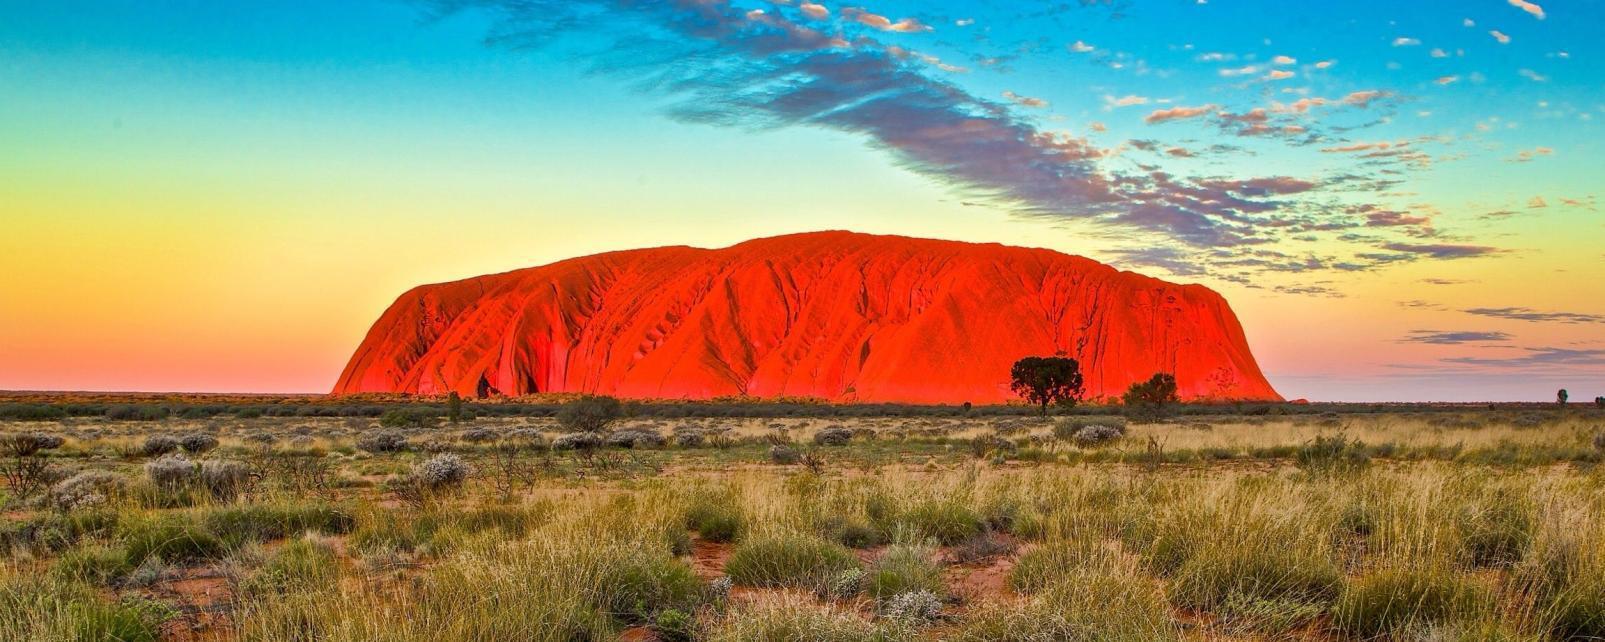 travel week long holiday melbourne australia less